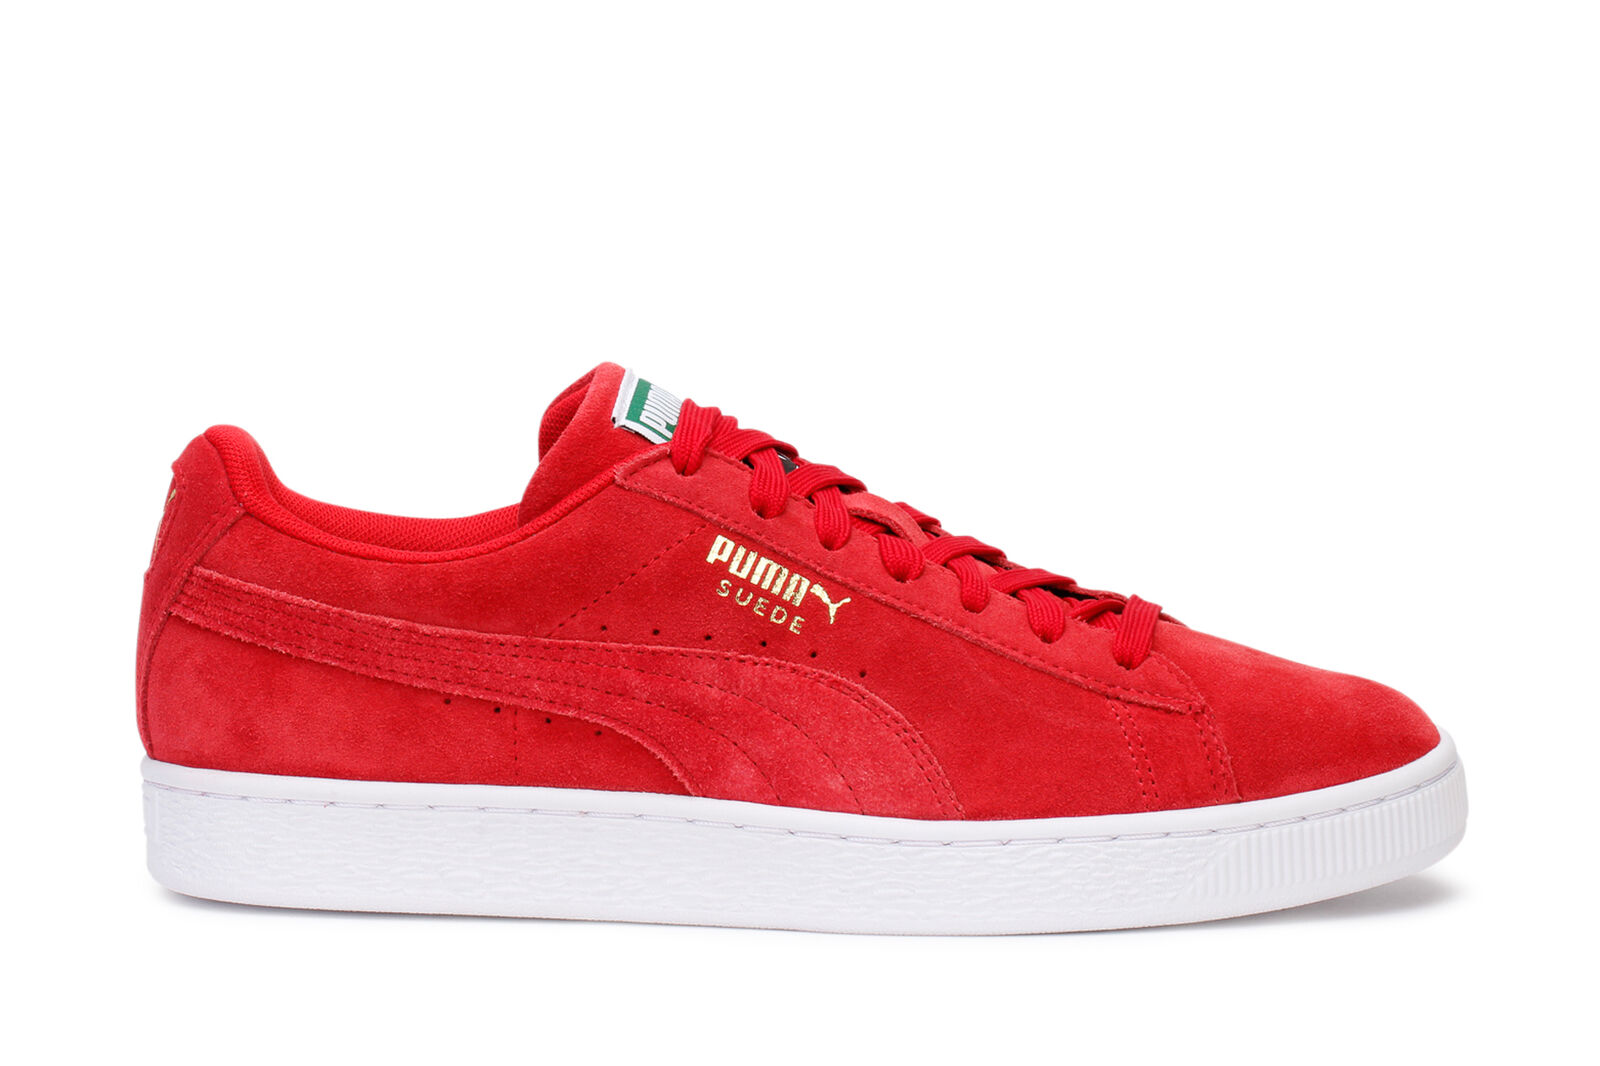 Puma alto Hombre Casual zapatillas Suede Classic   alto Puma riesgo Rojo Blanco 356568-63 77c5c1